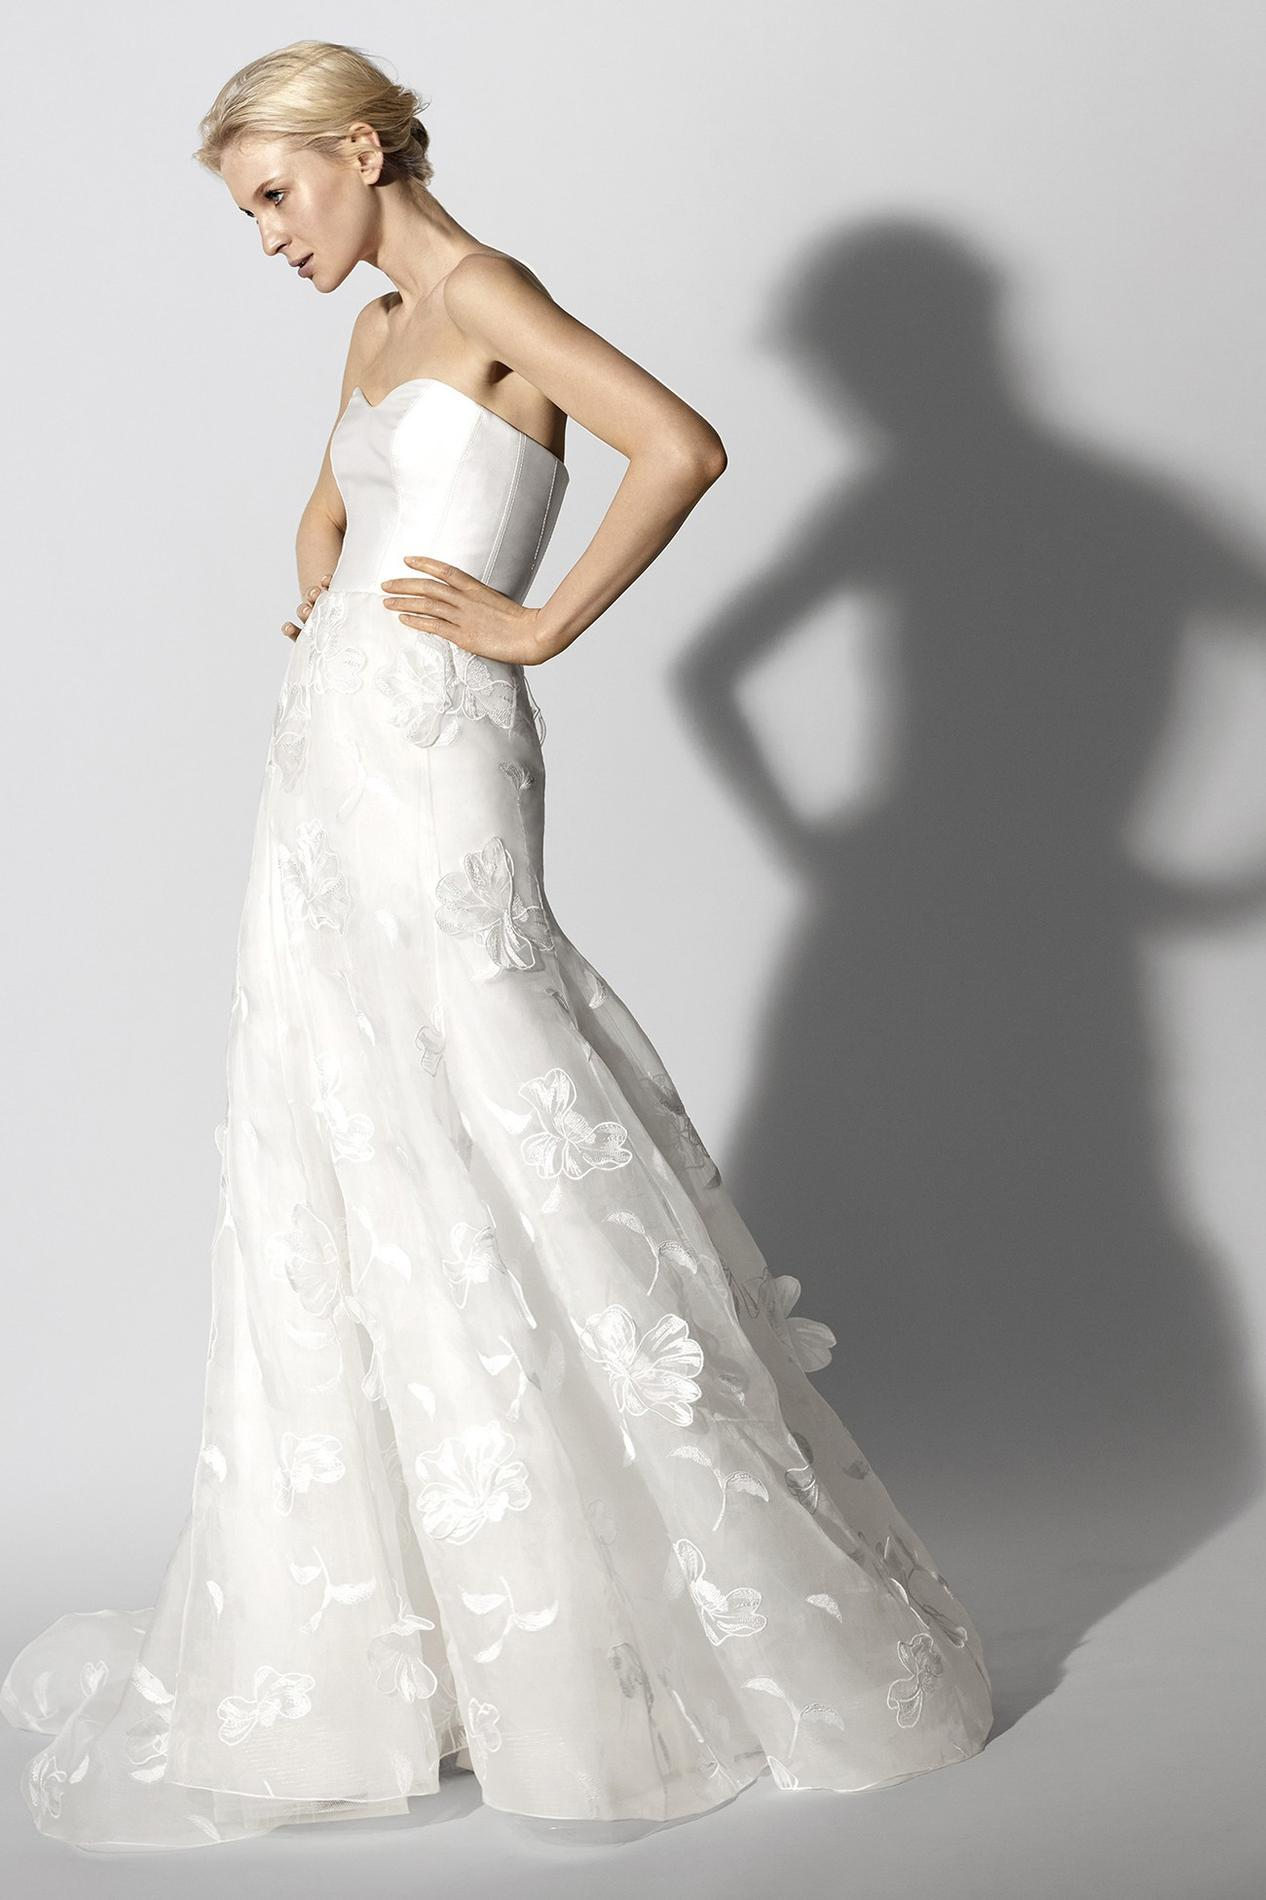 Photo presse BHLDN Quelle robe de mariée choisir lorsque l on a une forte  poitrine   - Carolina Herrera ... d7f03d09252